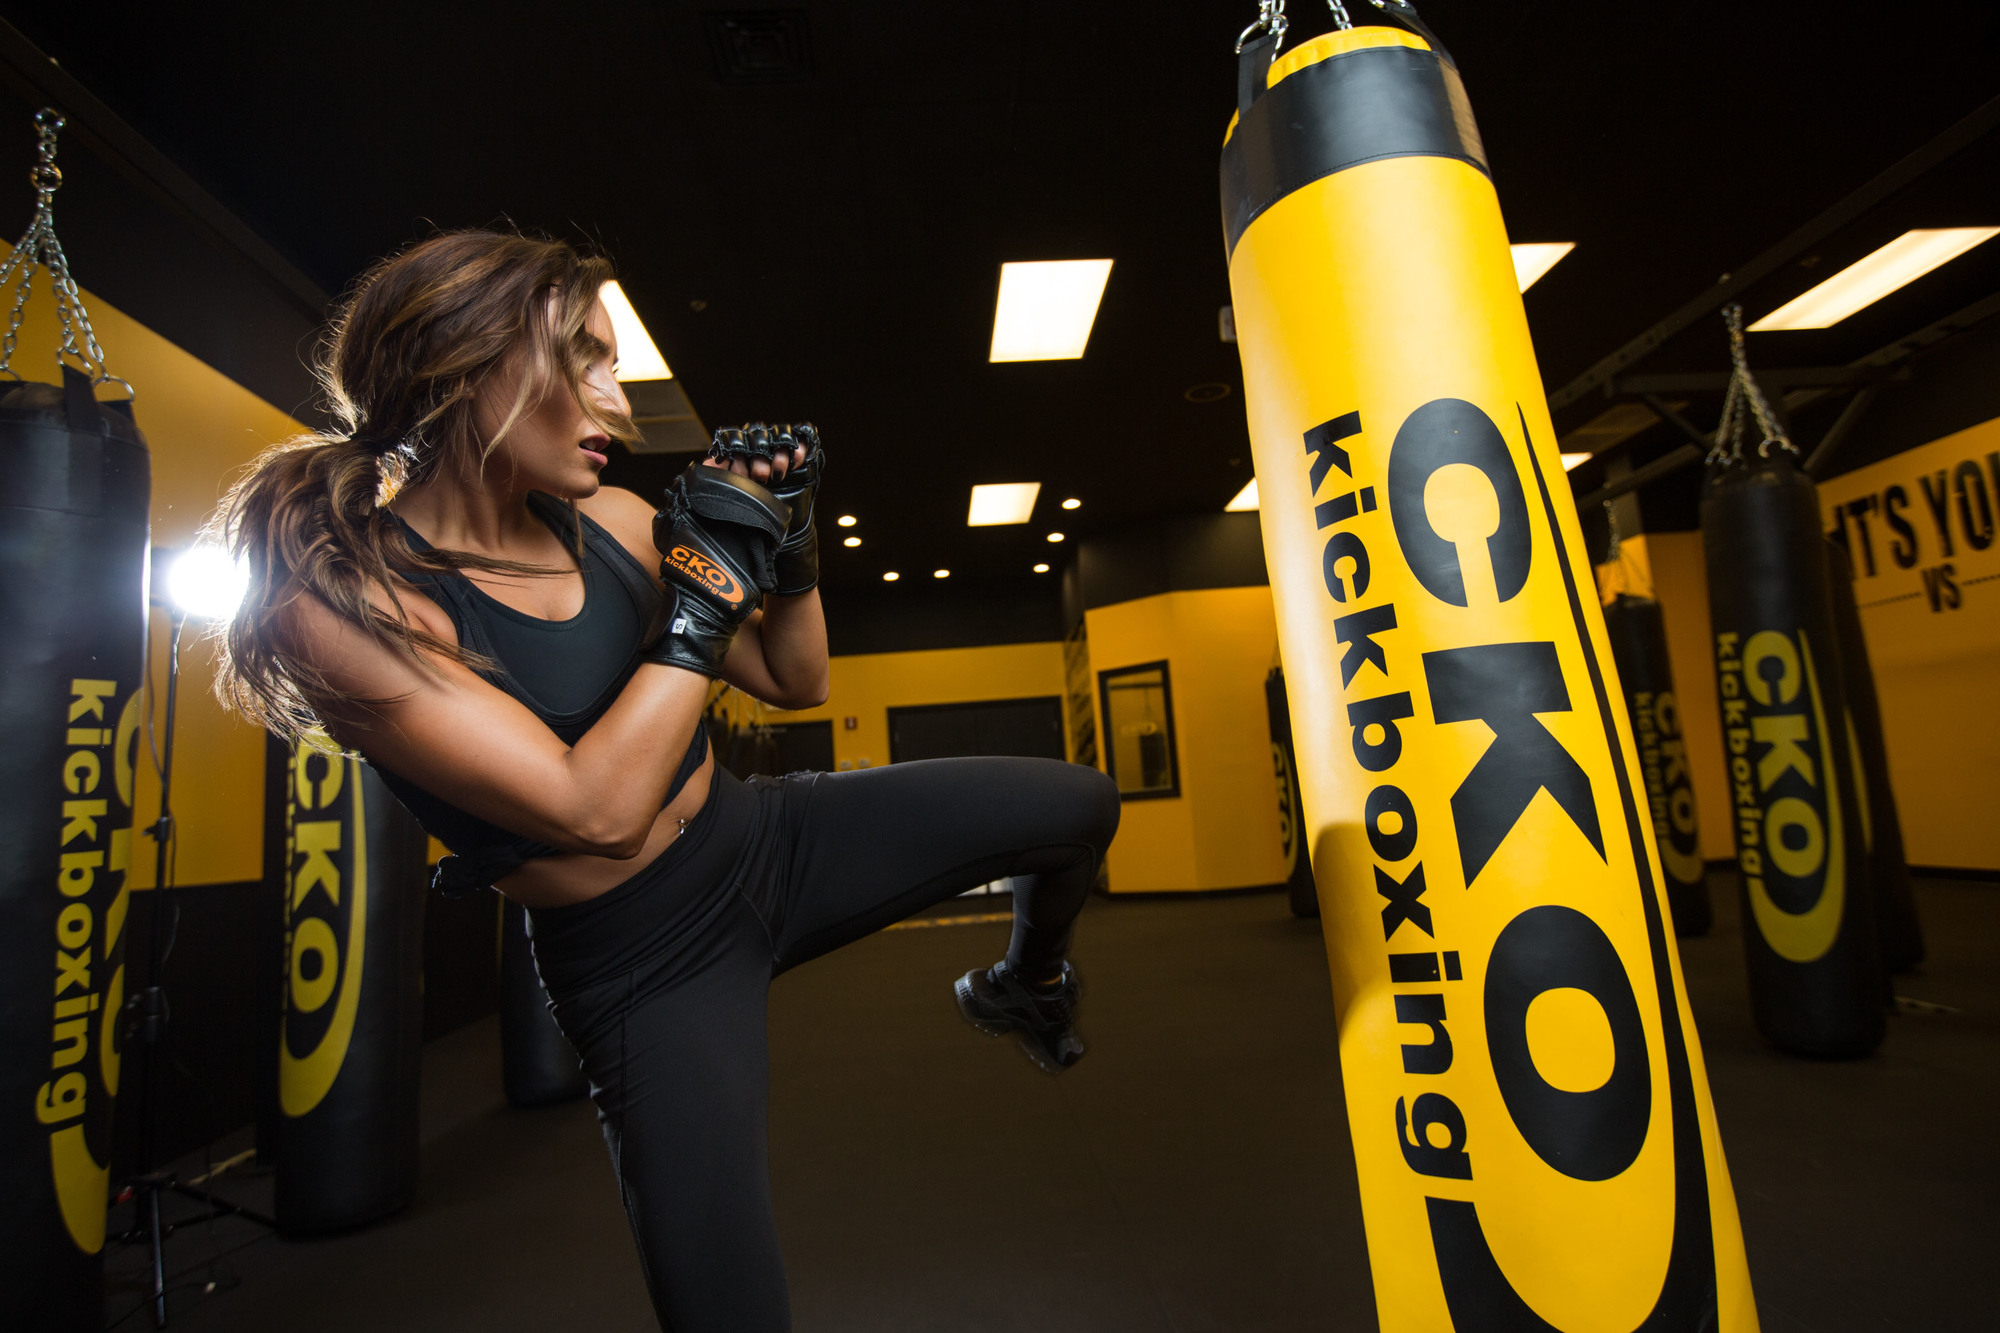 Trainer high kick on punching bag.